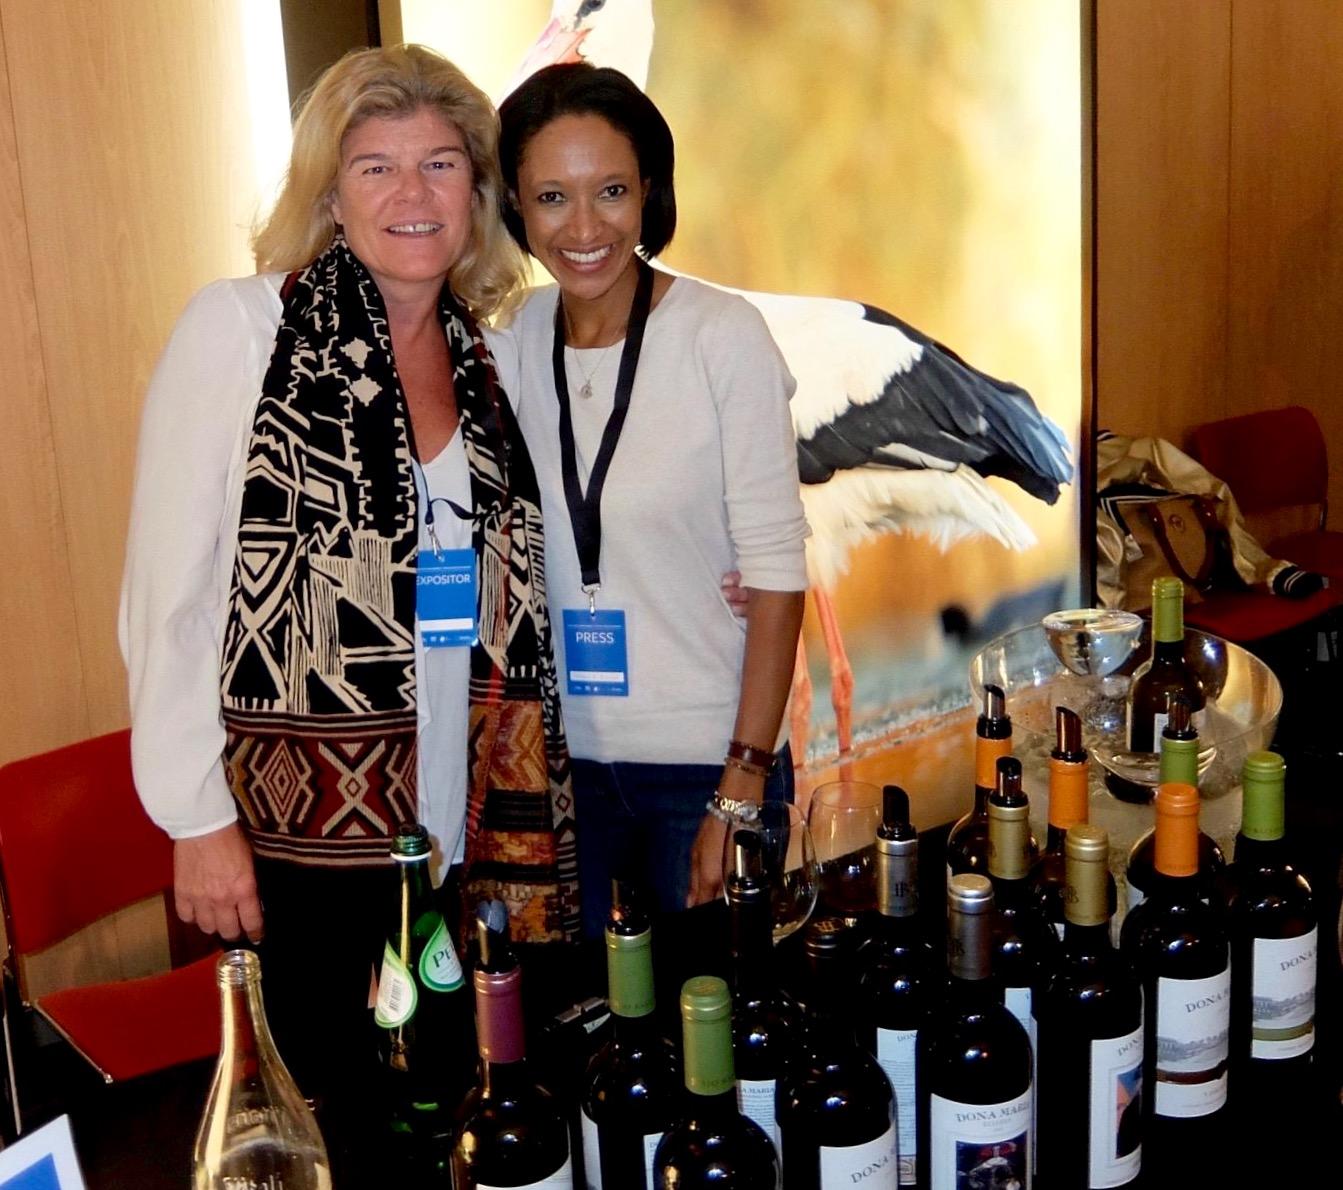 isabel bastos of don maria wines